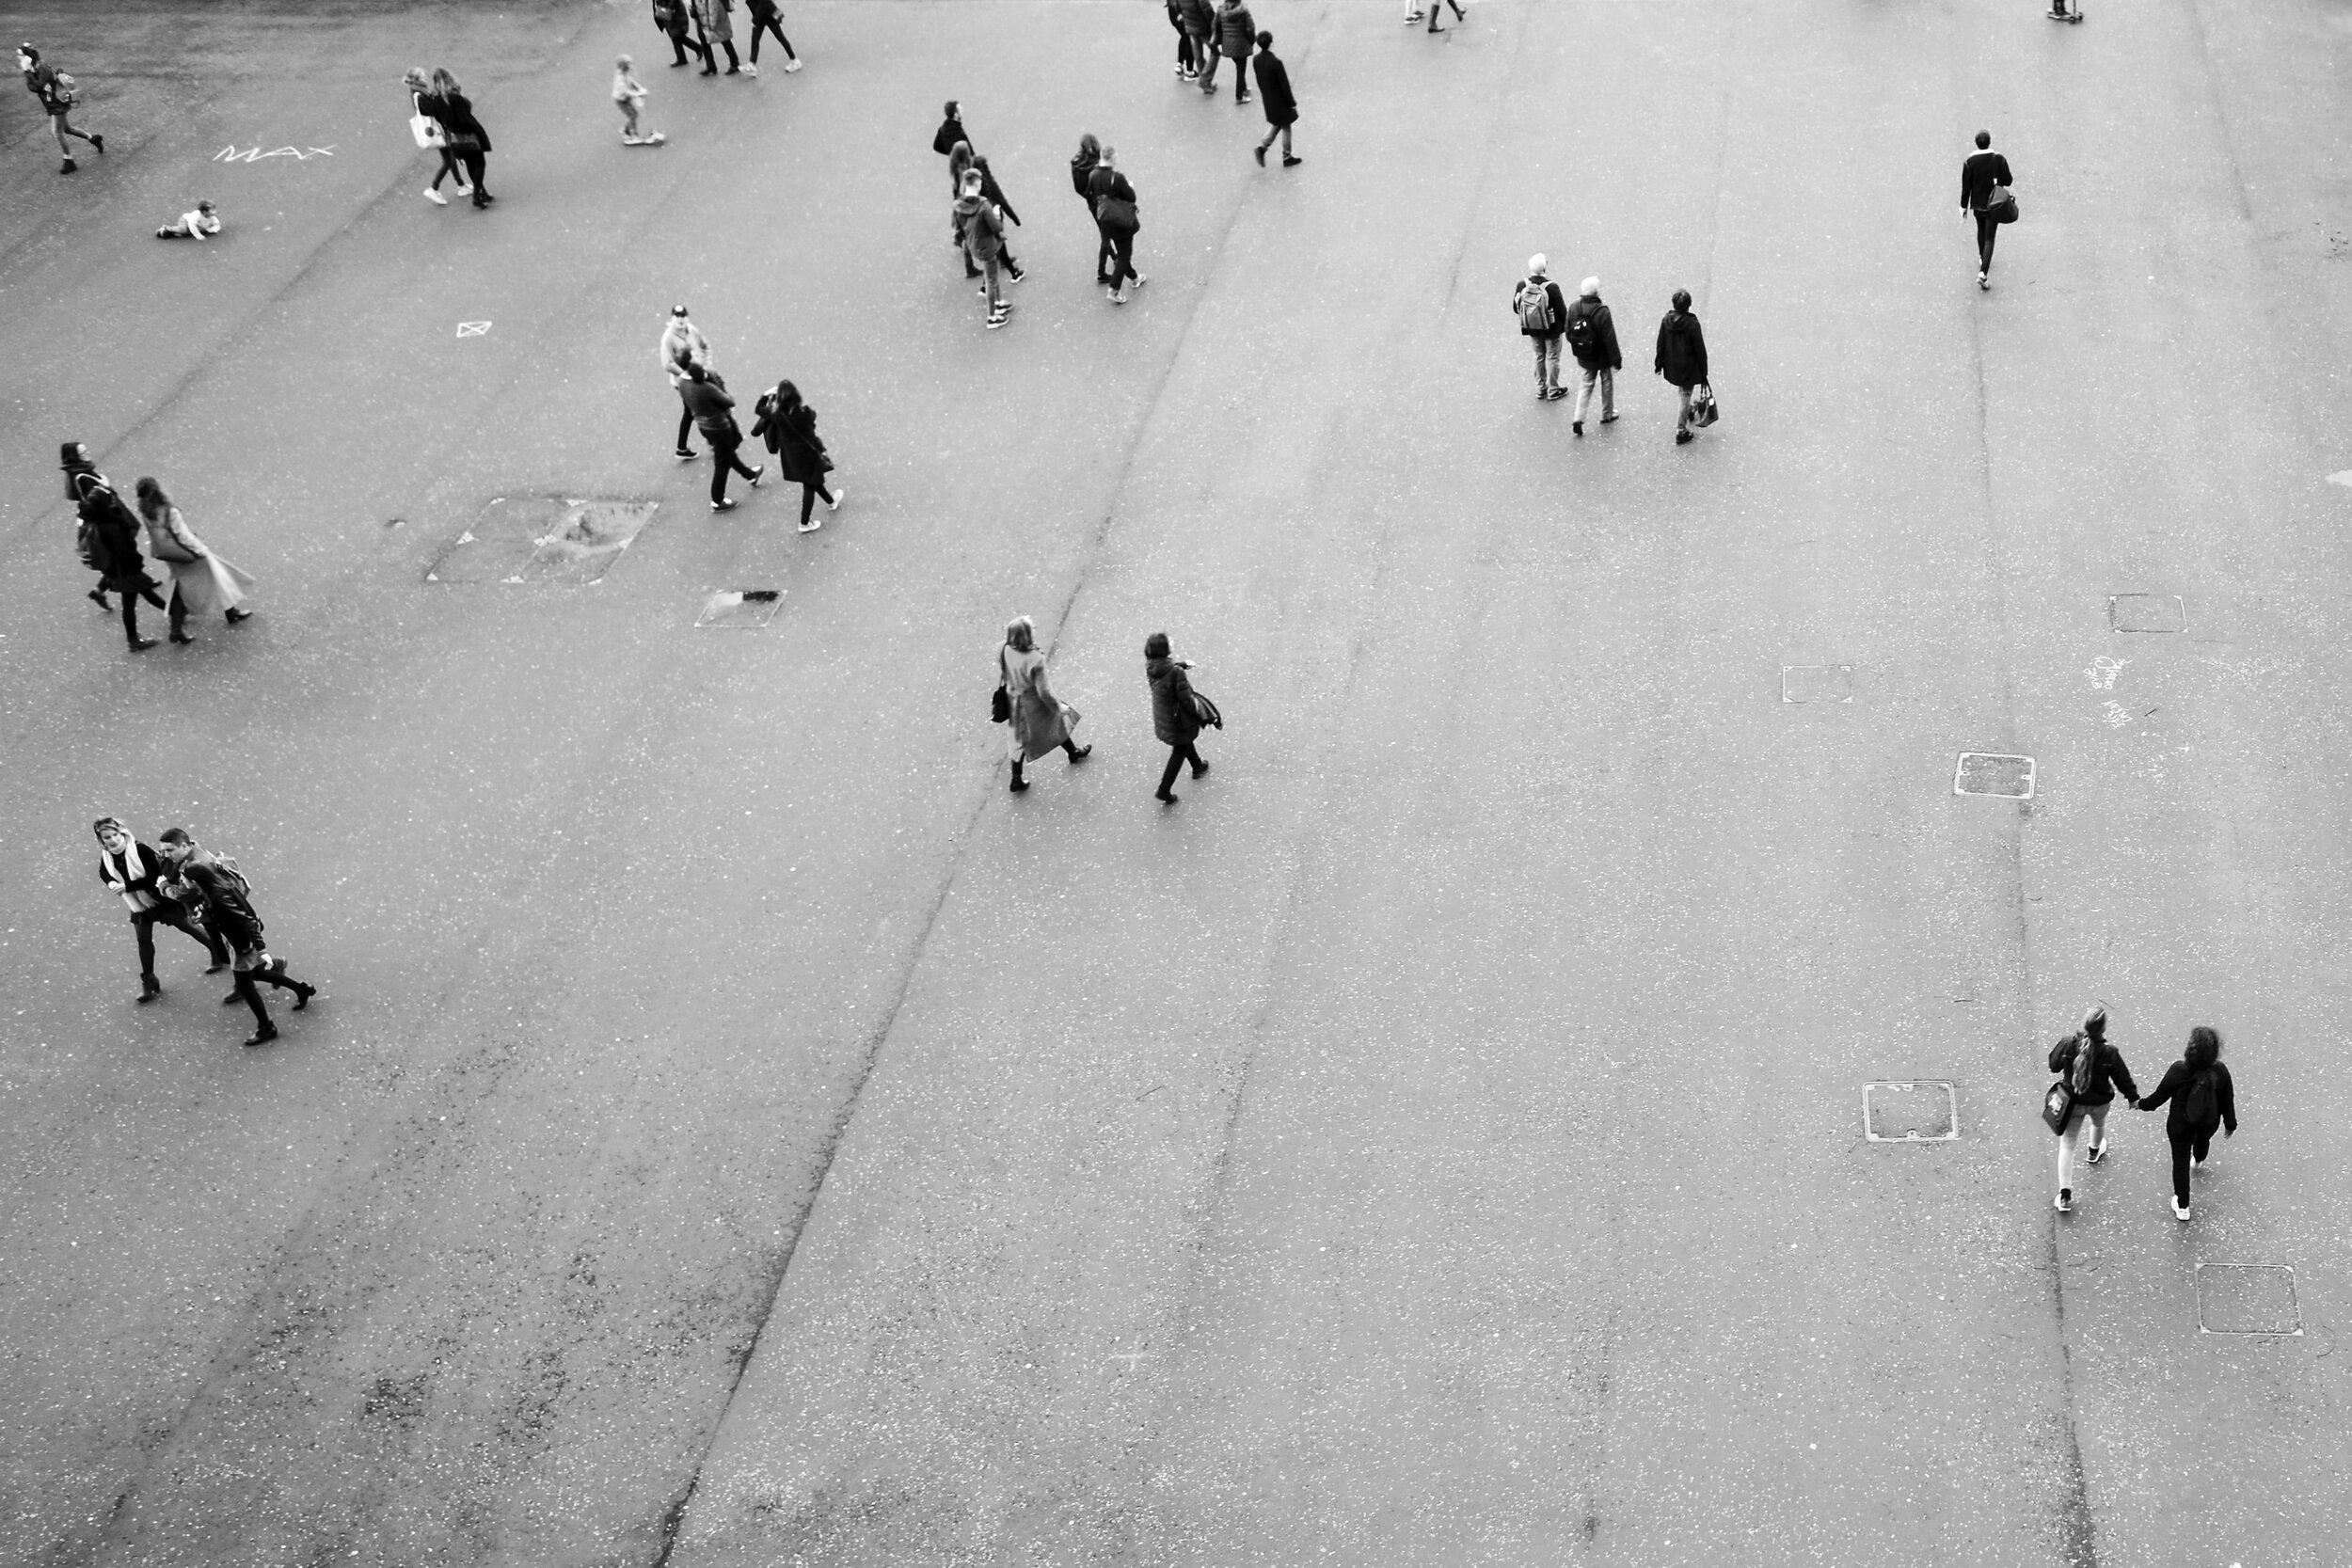 Photo by  John Simitopoulos  on  Unsplash